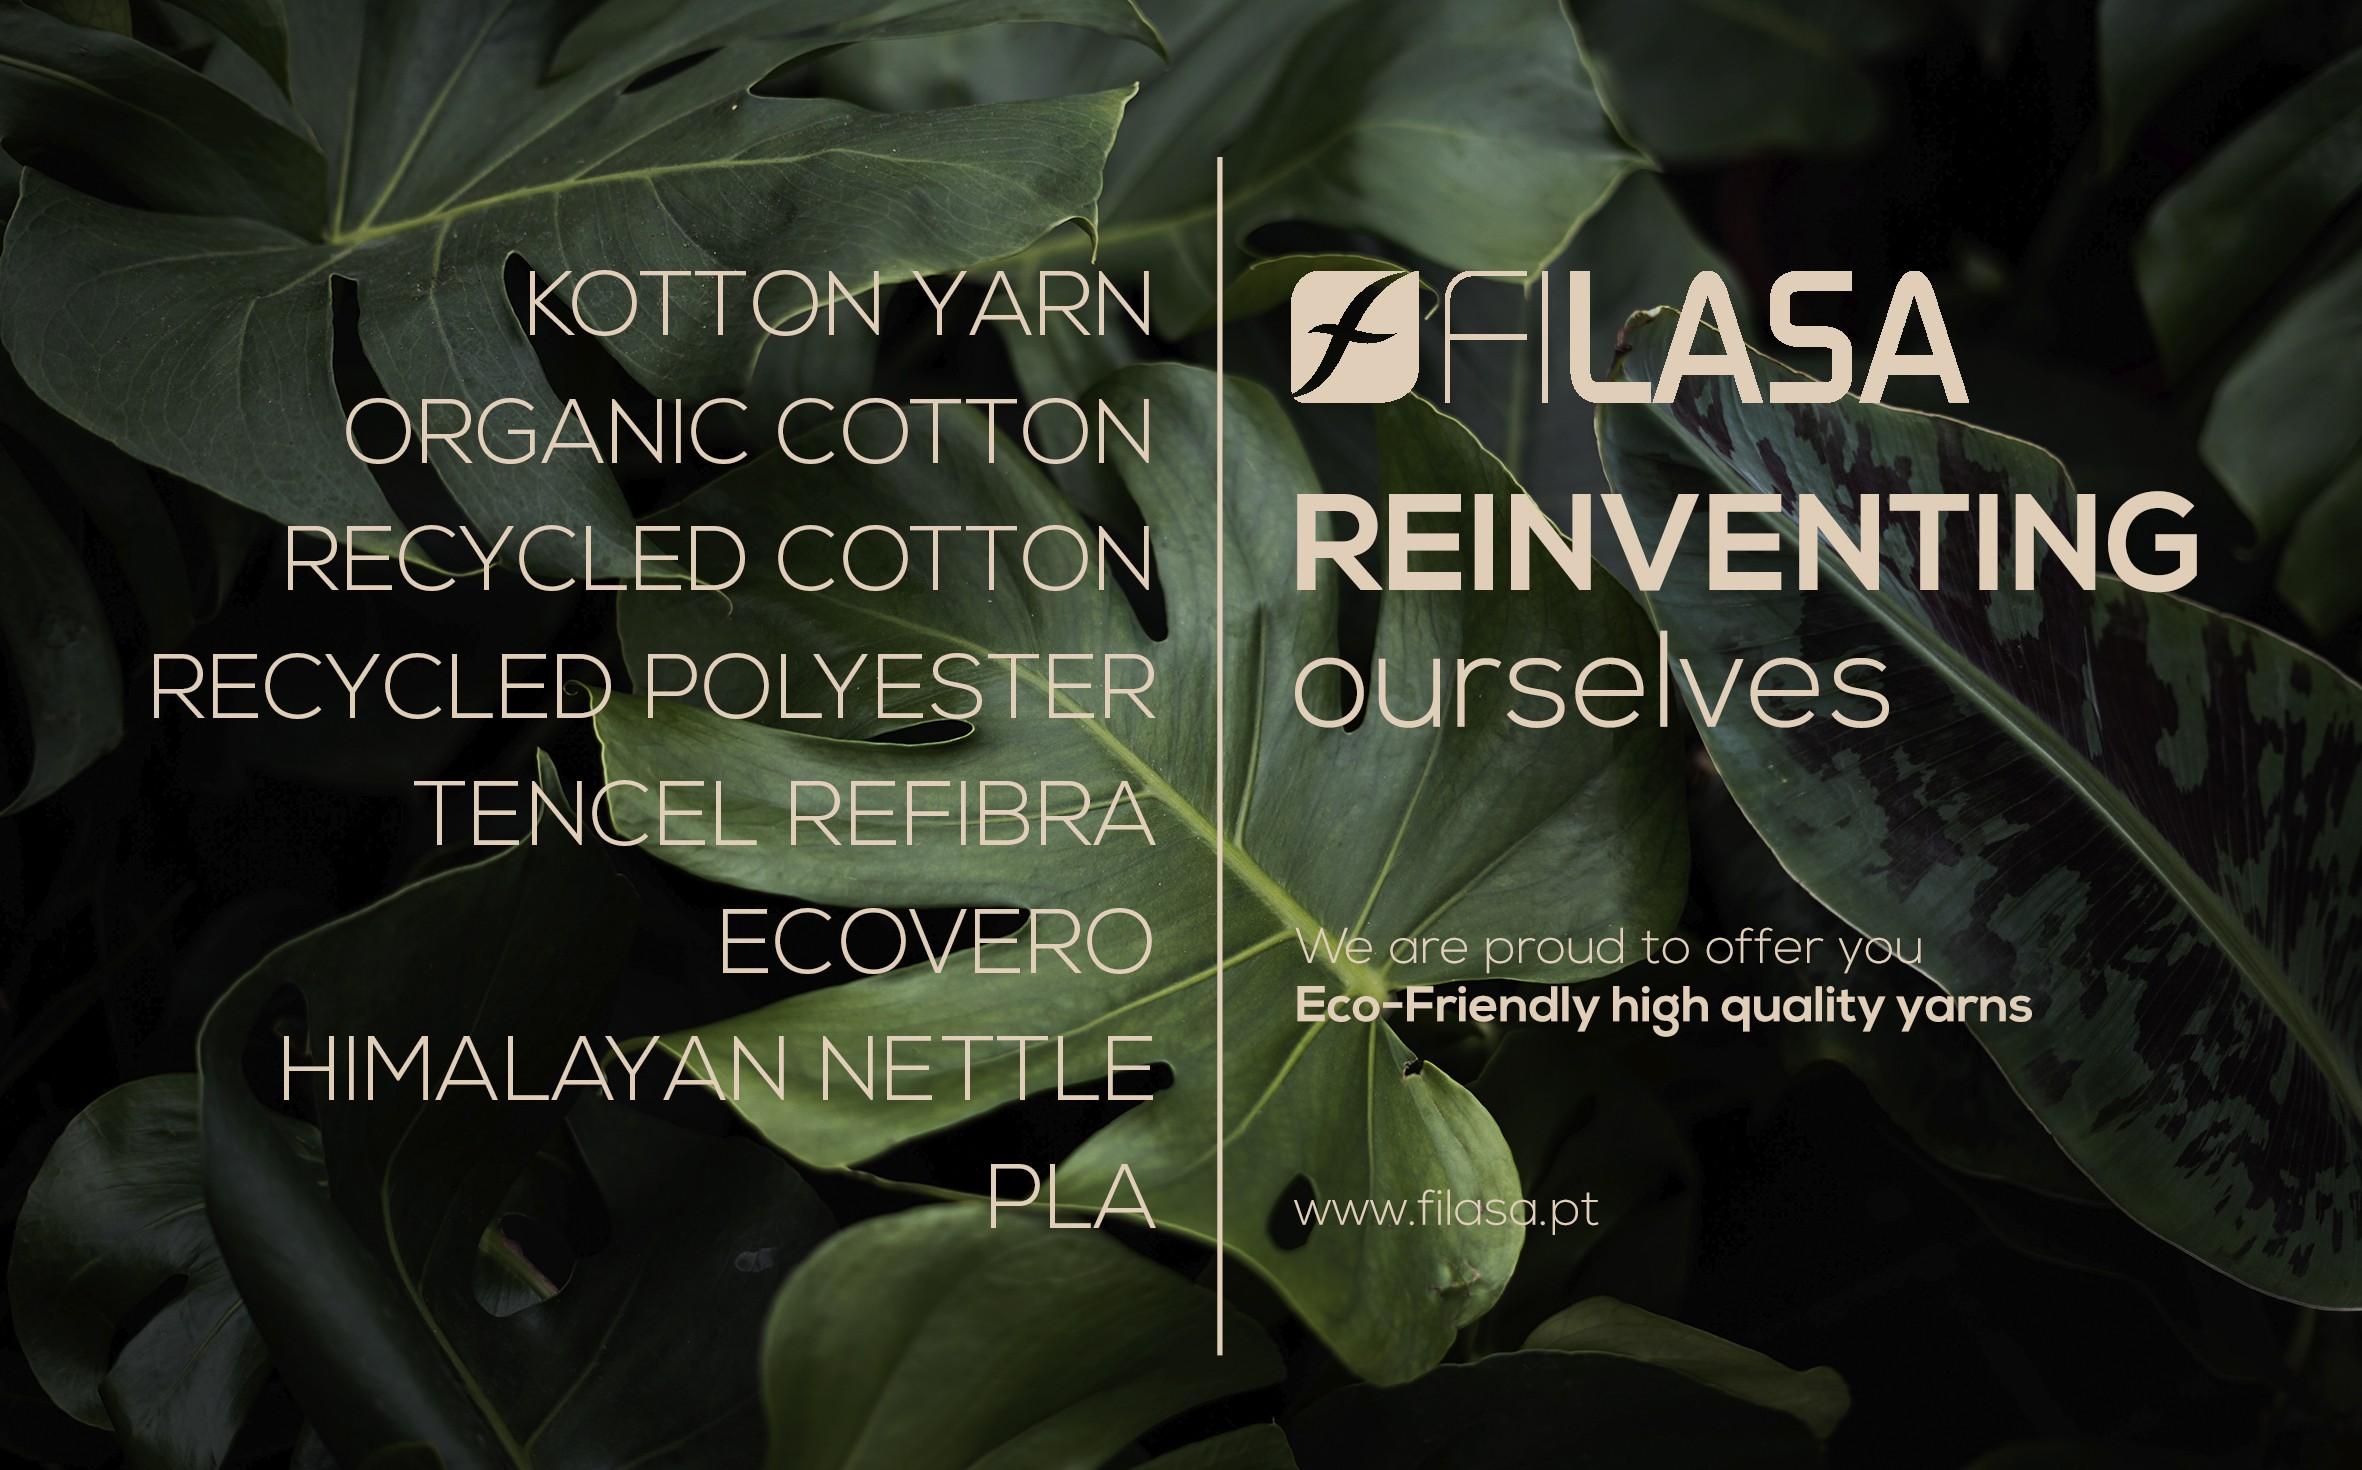 Filasa Experience For Environmentally Friendly Yarns